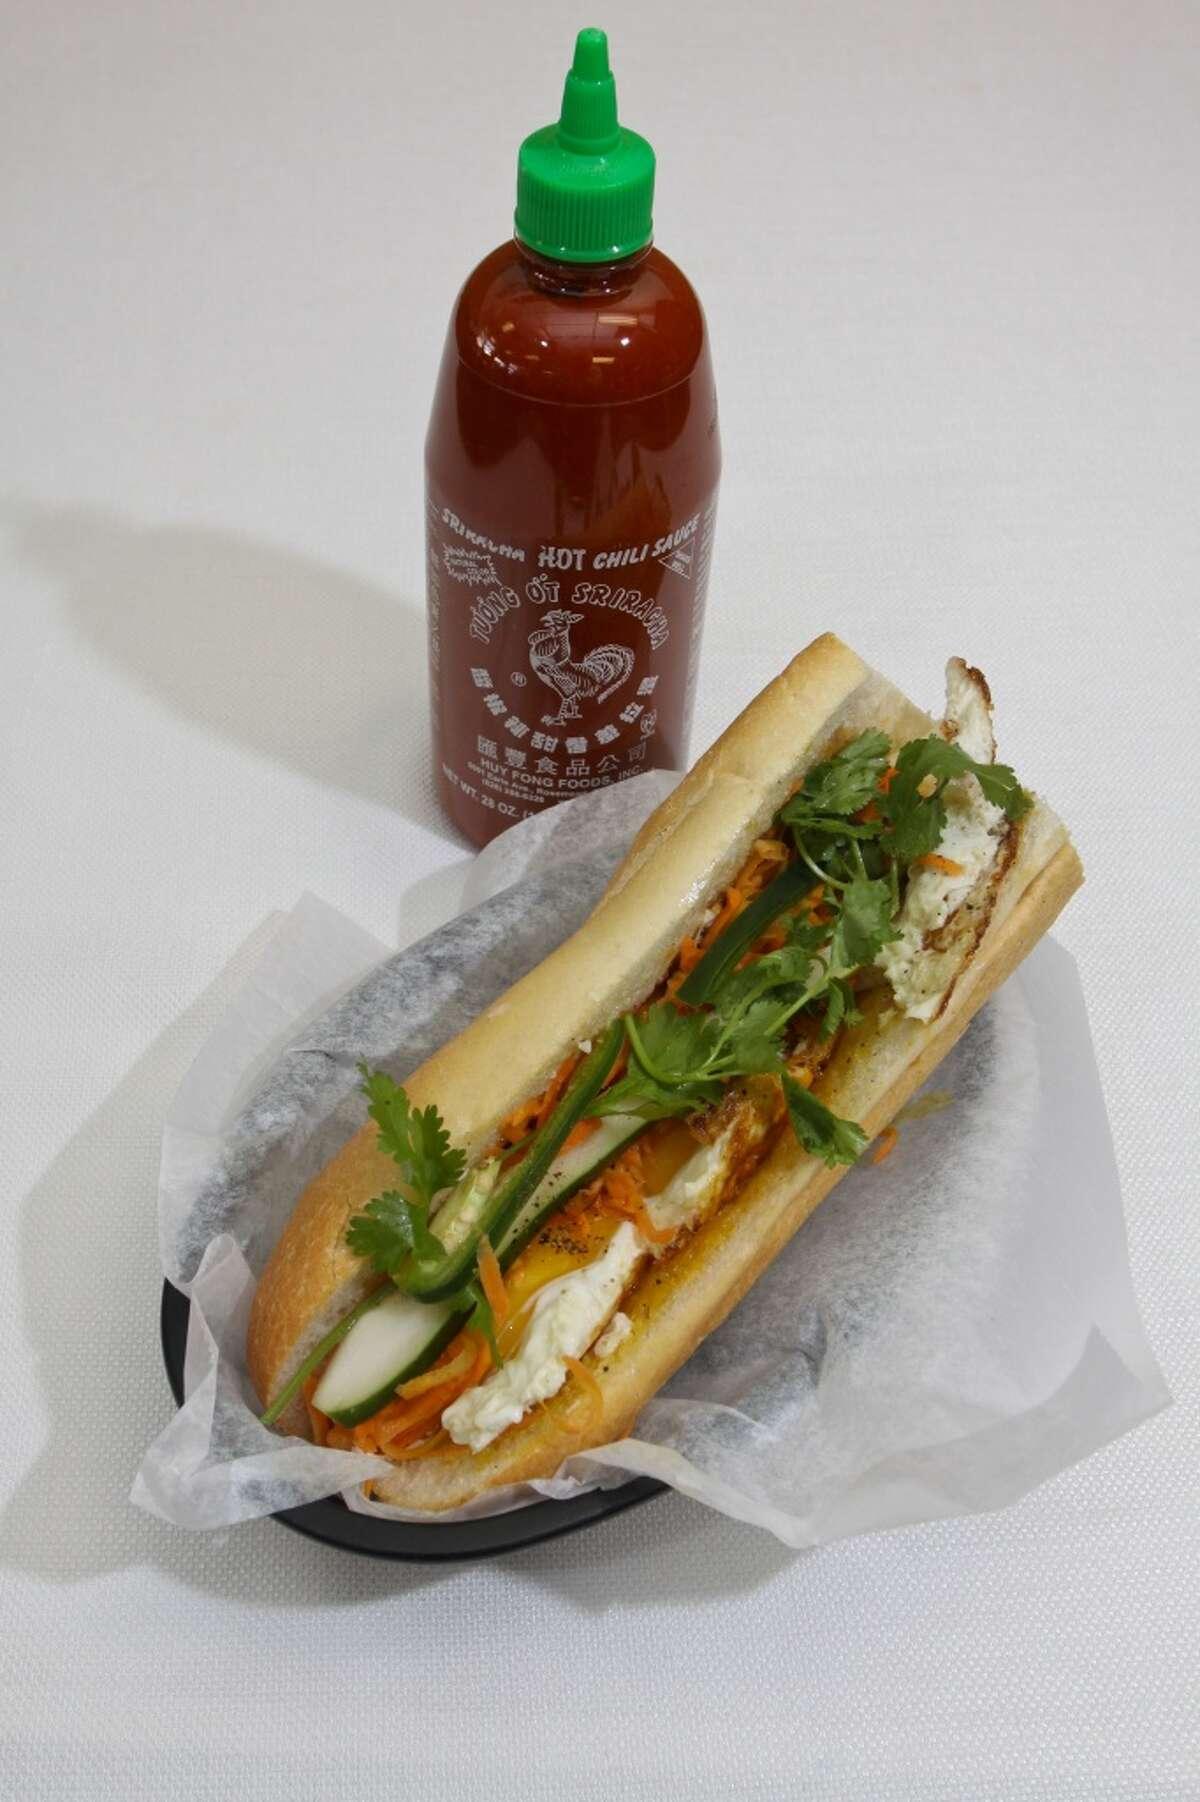 Egg sandwich and Sriracha sauce at Cafe TH